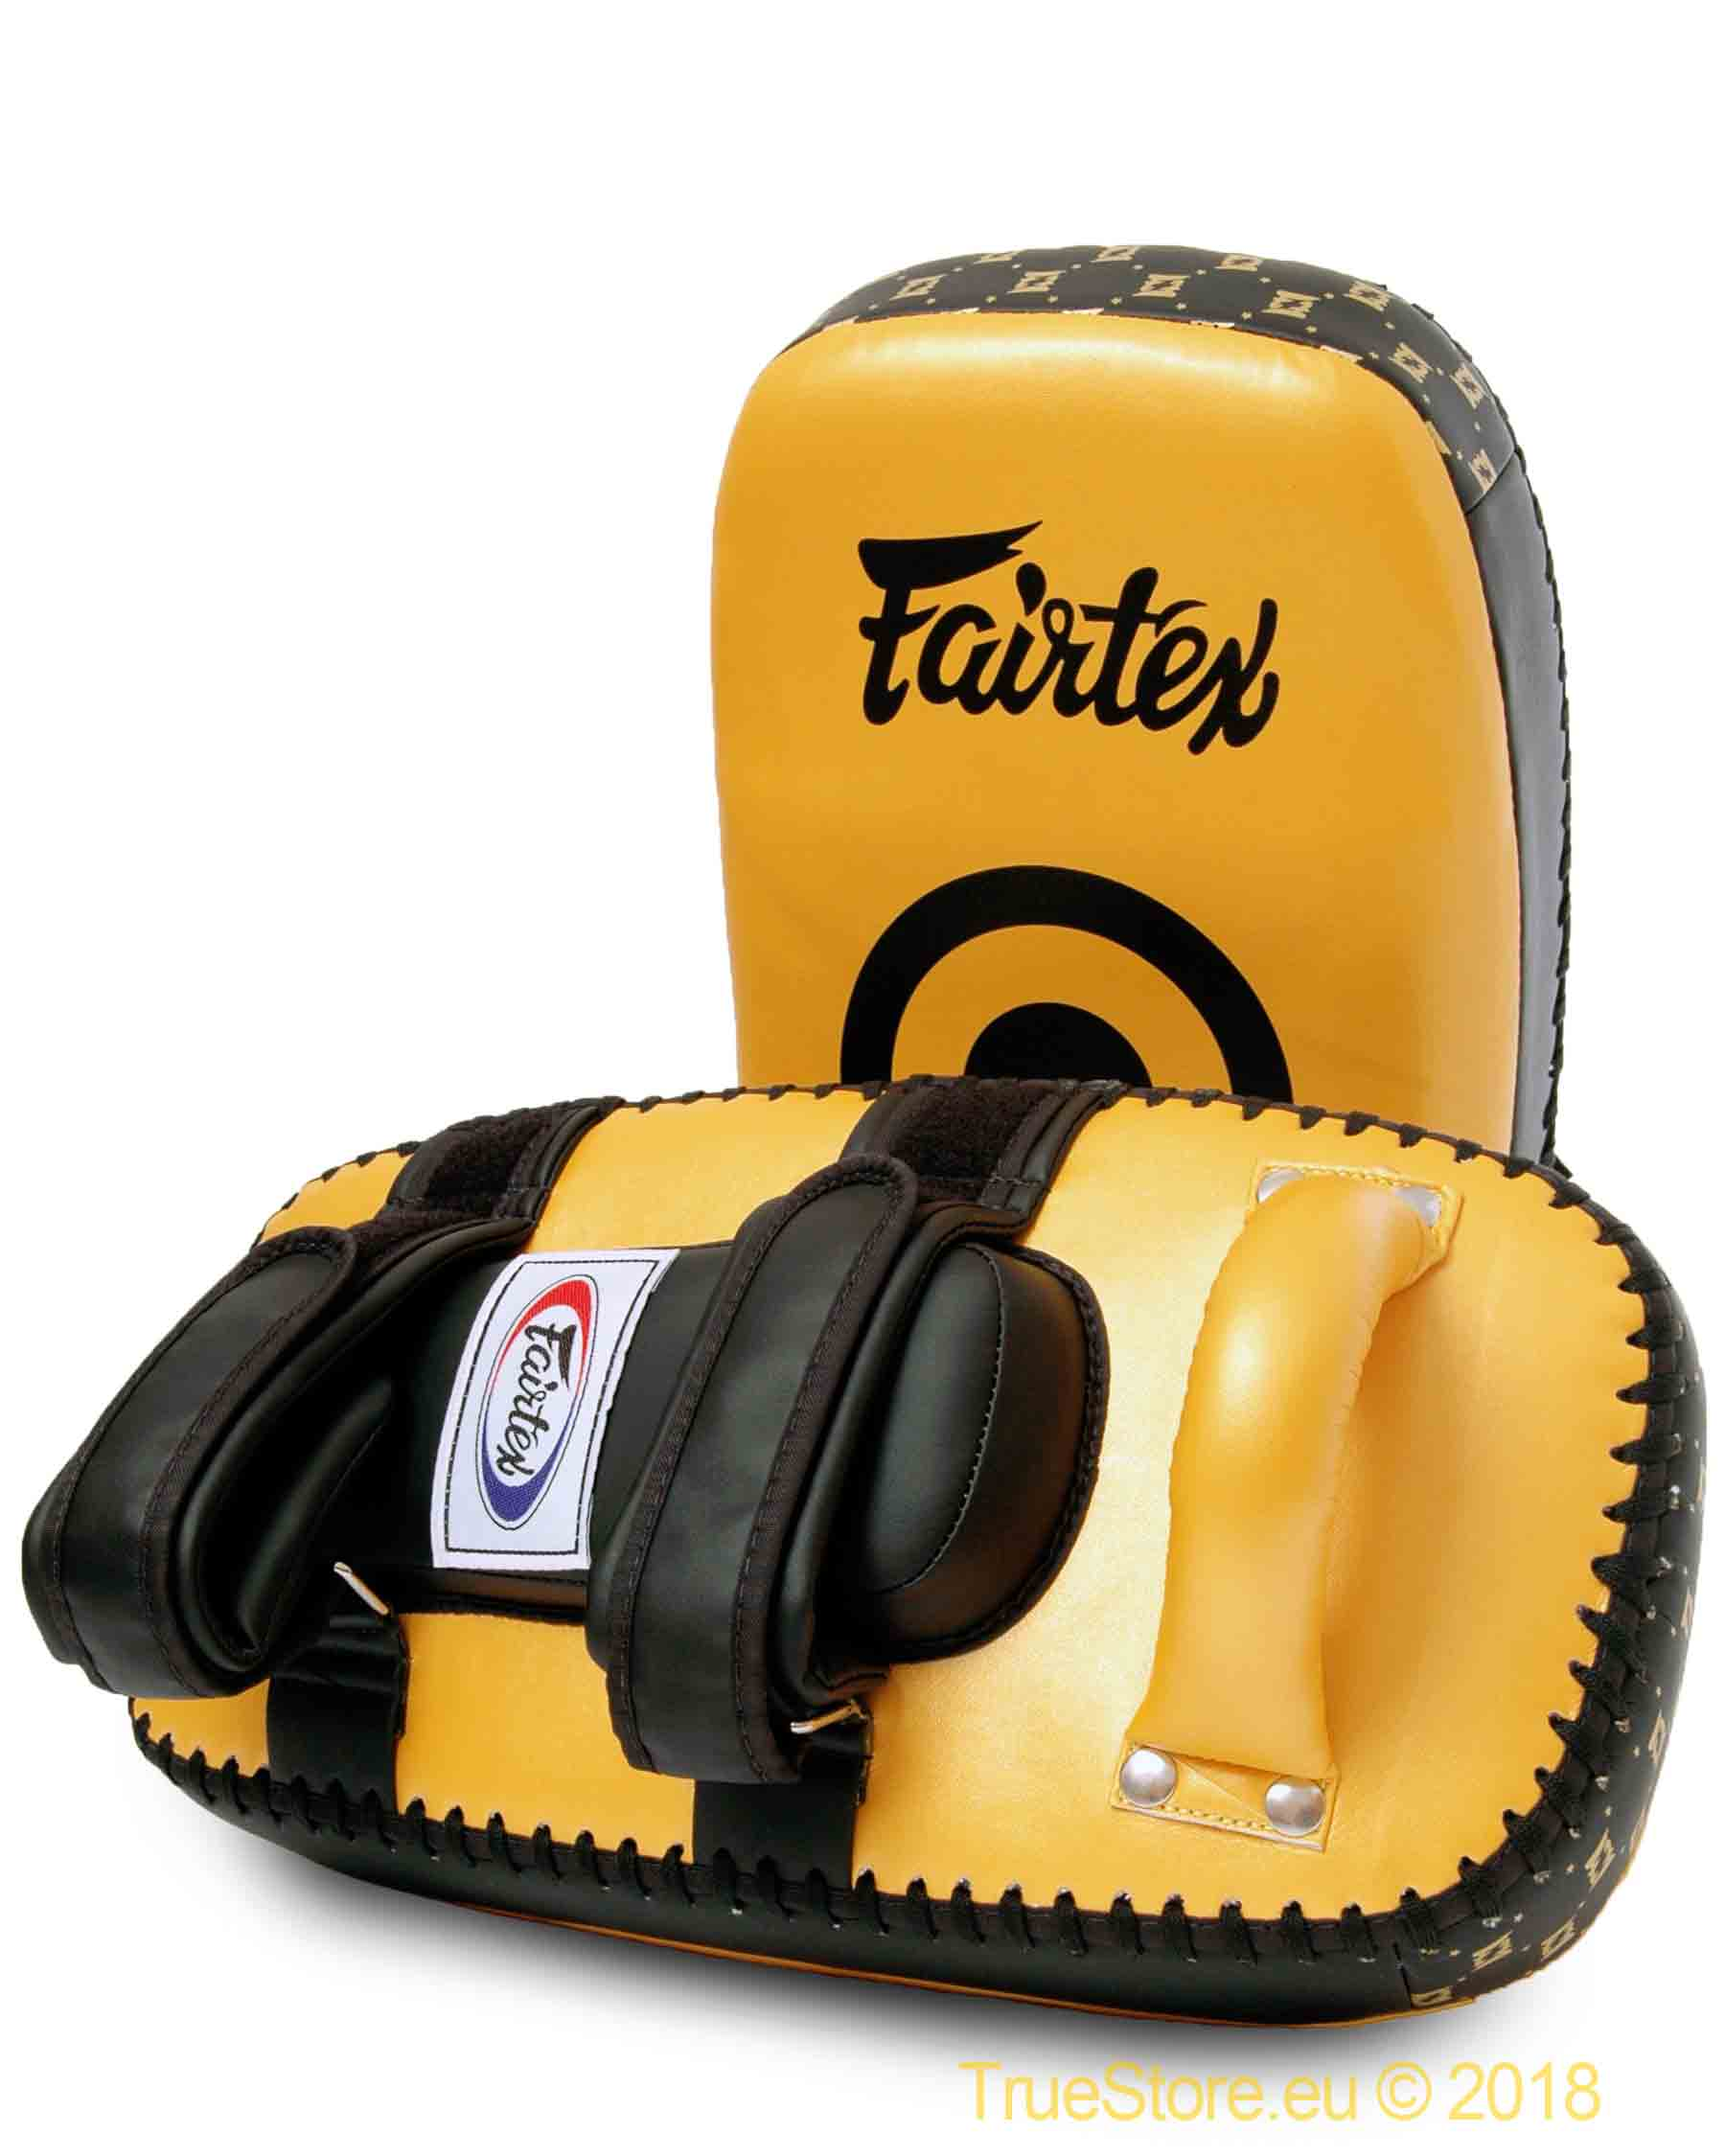 New Fairtex Curved Muay Thai Kick Boxing Kicking Pads KPLC